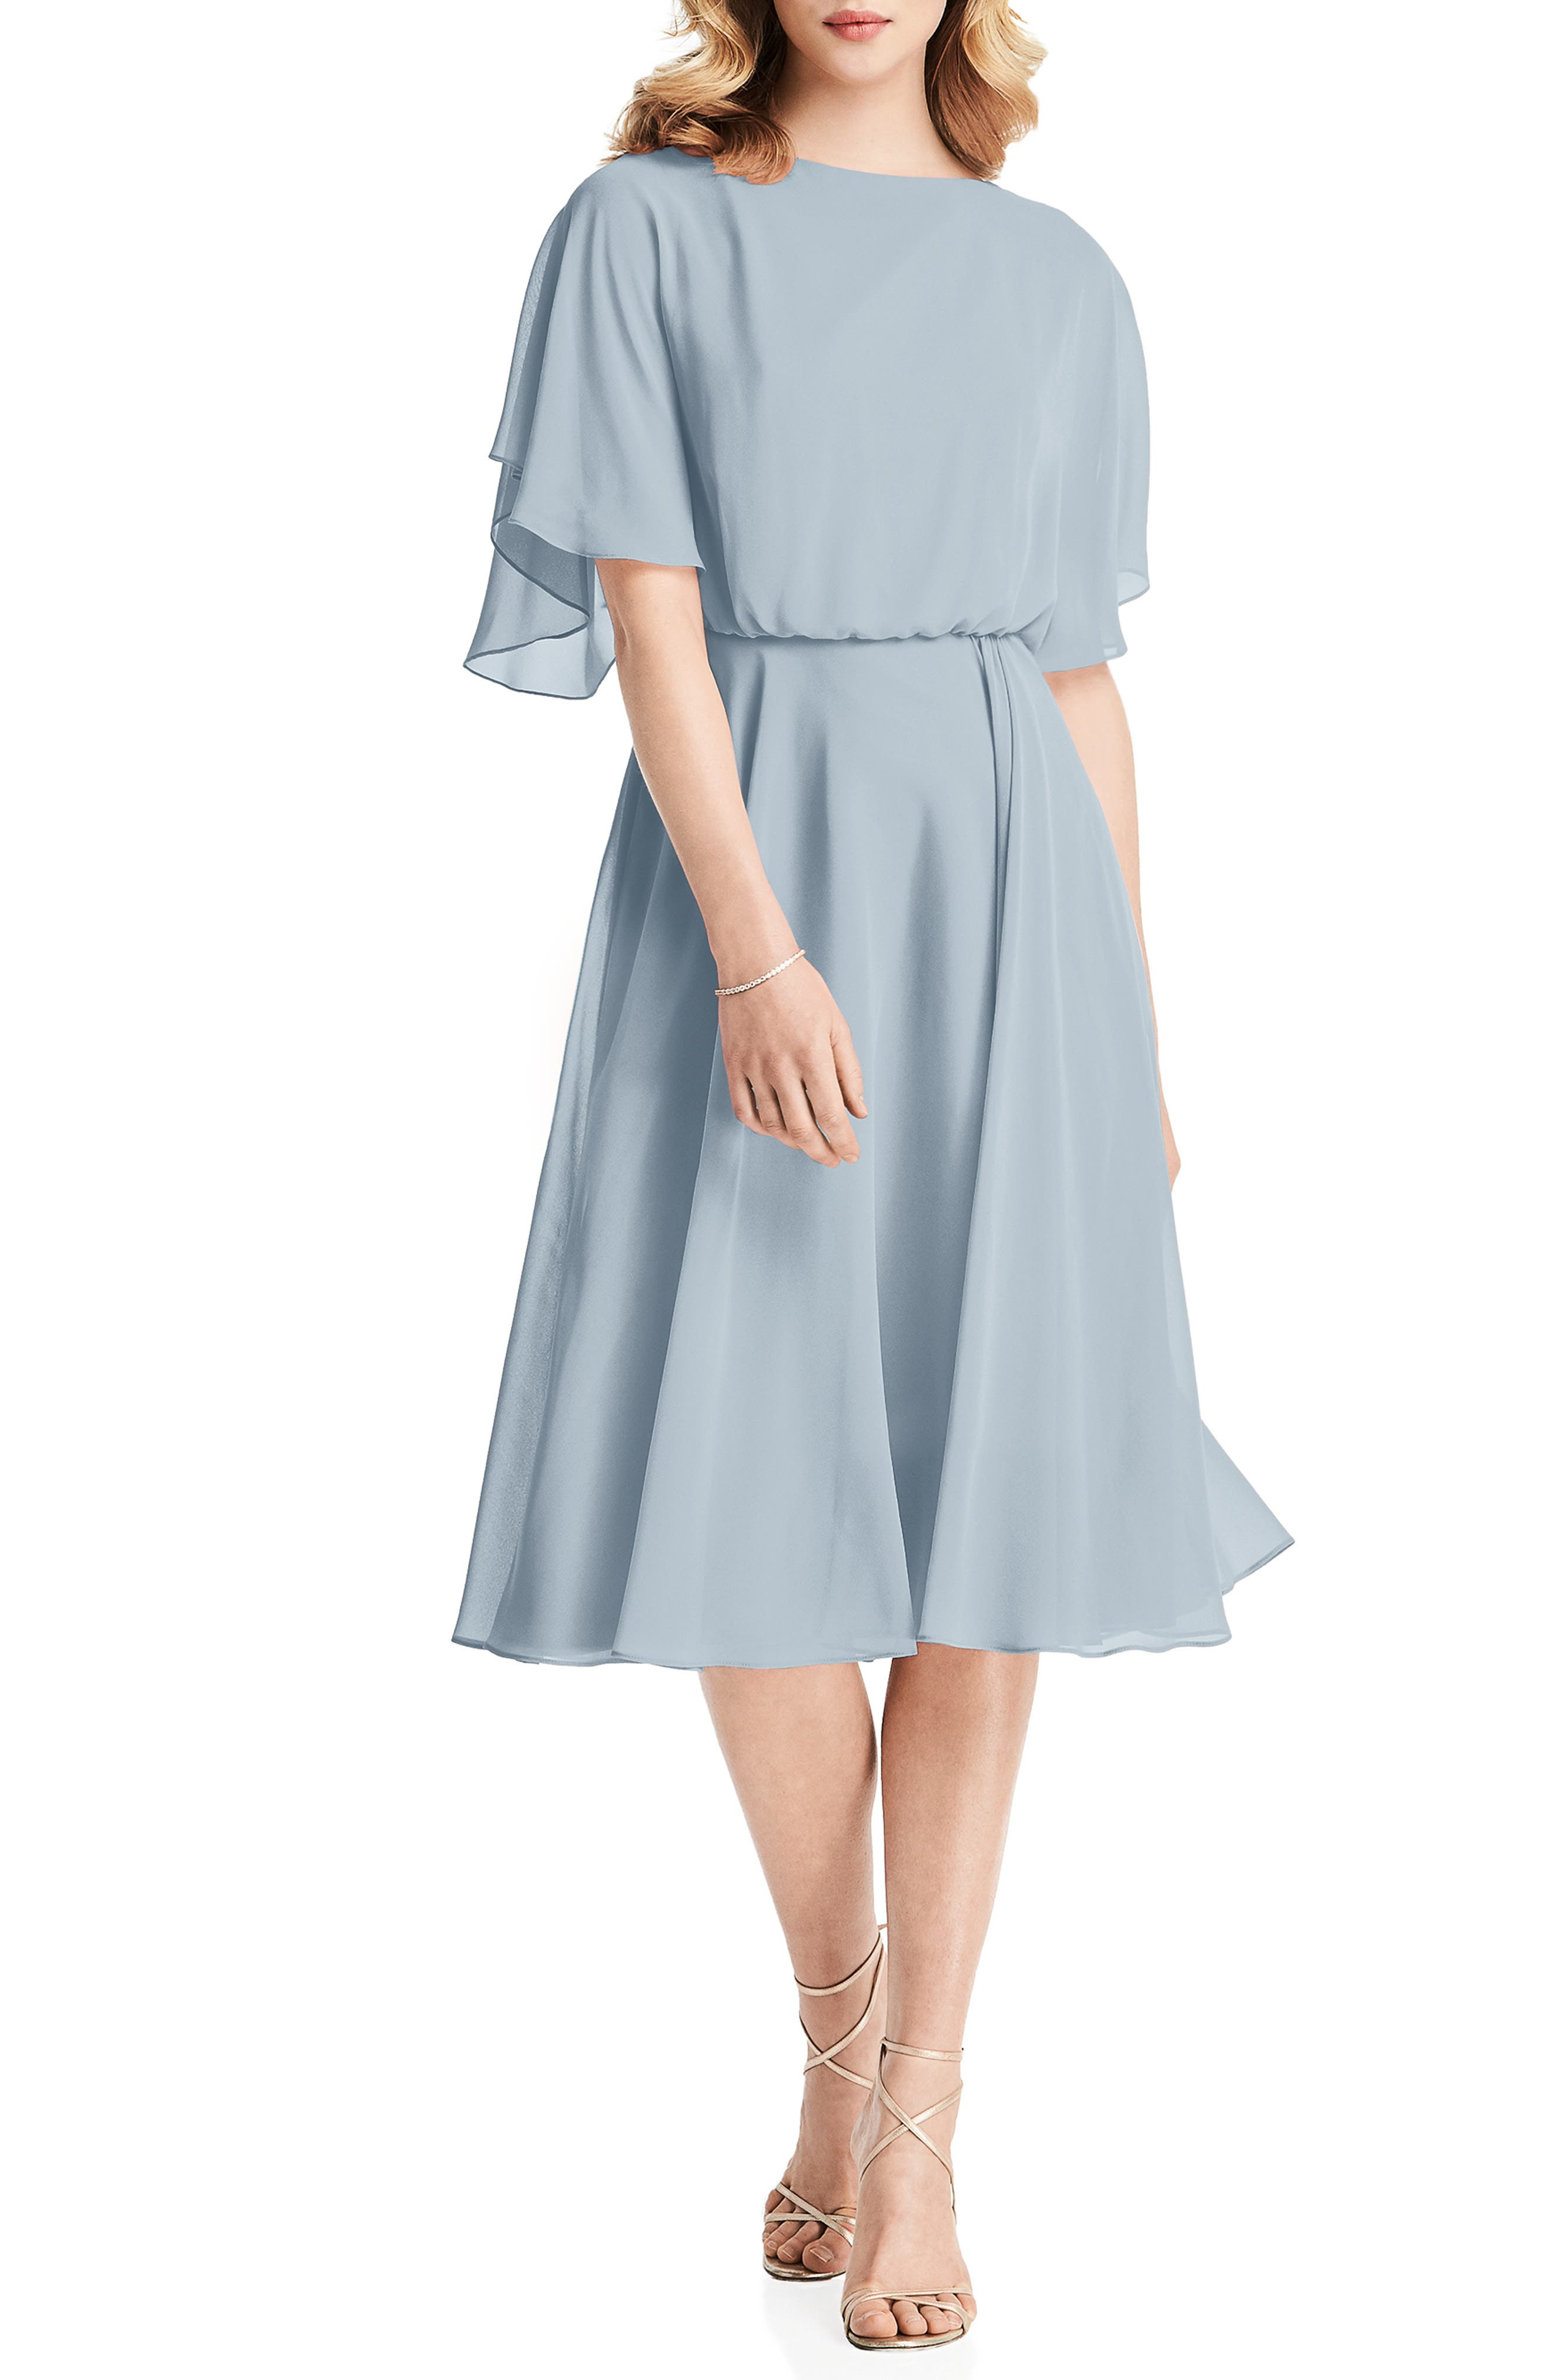 1960s Dresses – A Rainbow of 50 Dresses (Pictures) Womens Jenny Packham Flutter Sleeve Open Back Chiffon Cocktail Dress Size 4 - Blue $250.00 AT vintagedancer.com